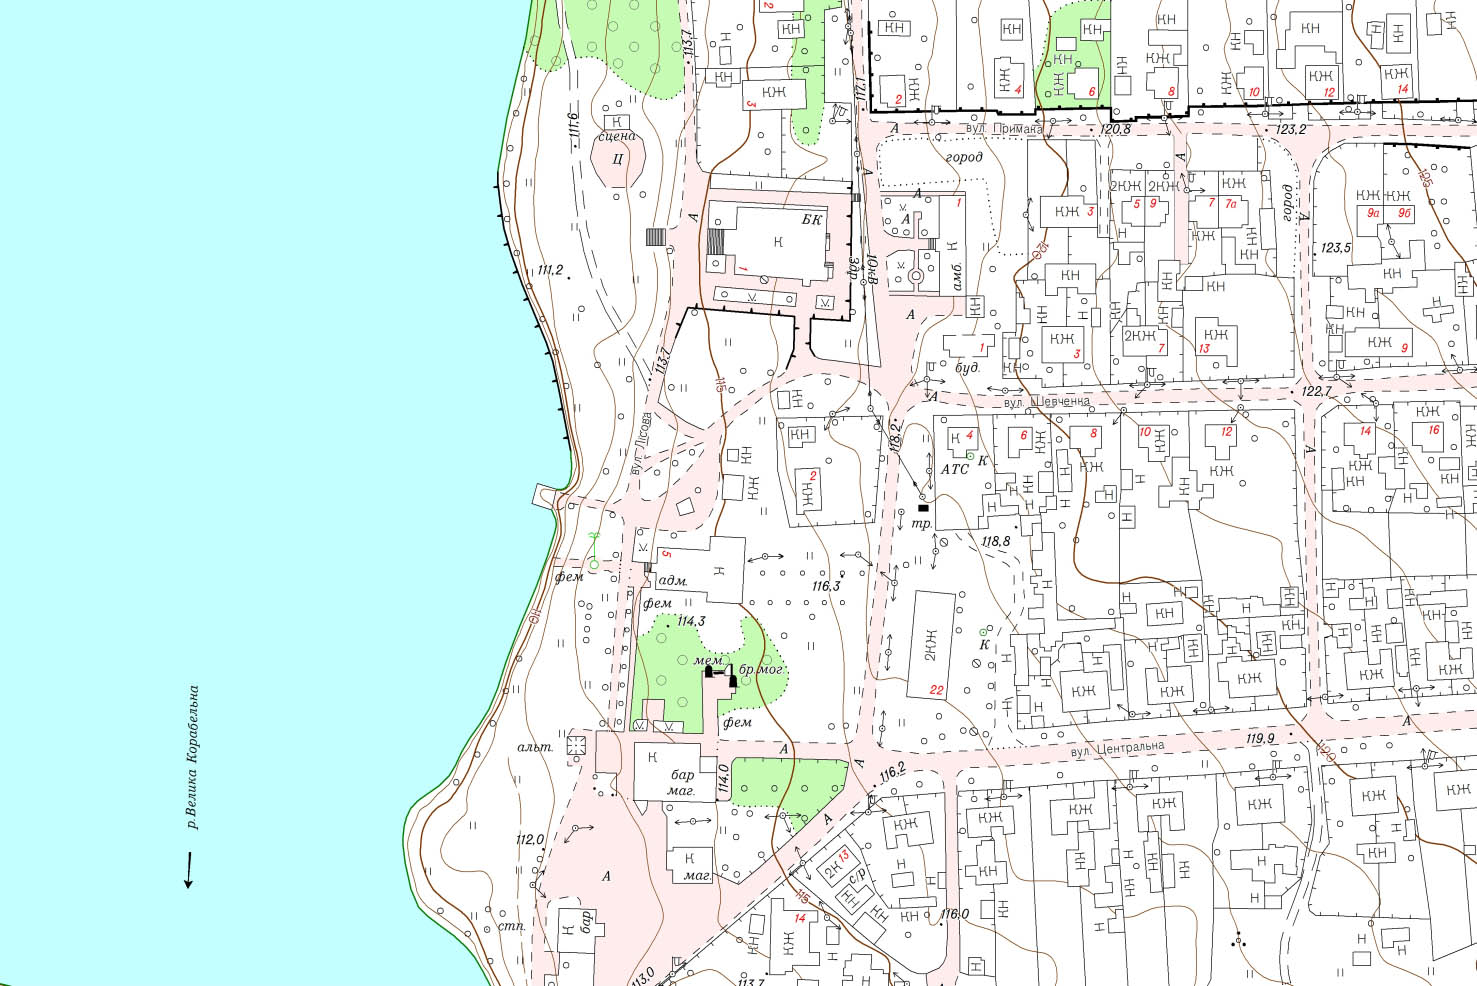 Фрагмент топографічного плану М1:2000 с. Воєводське